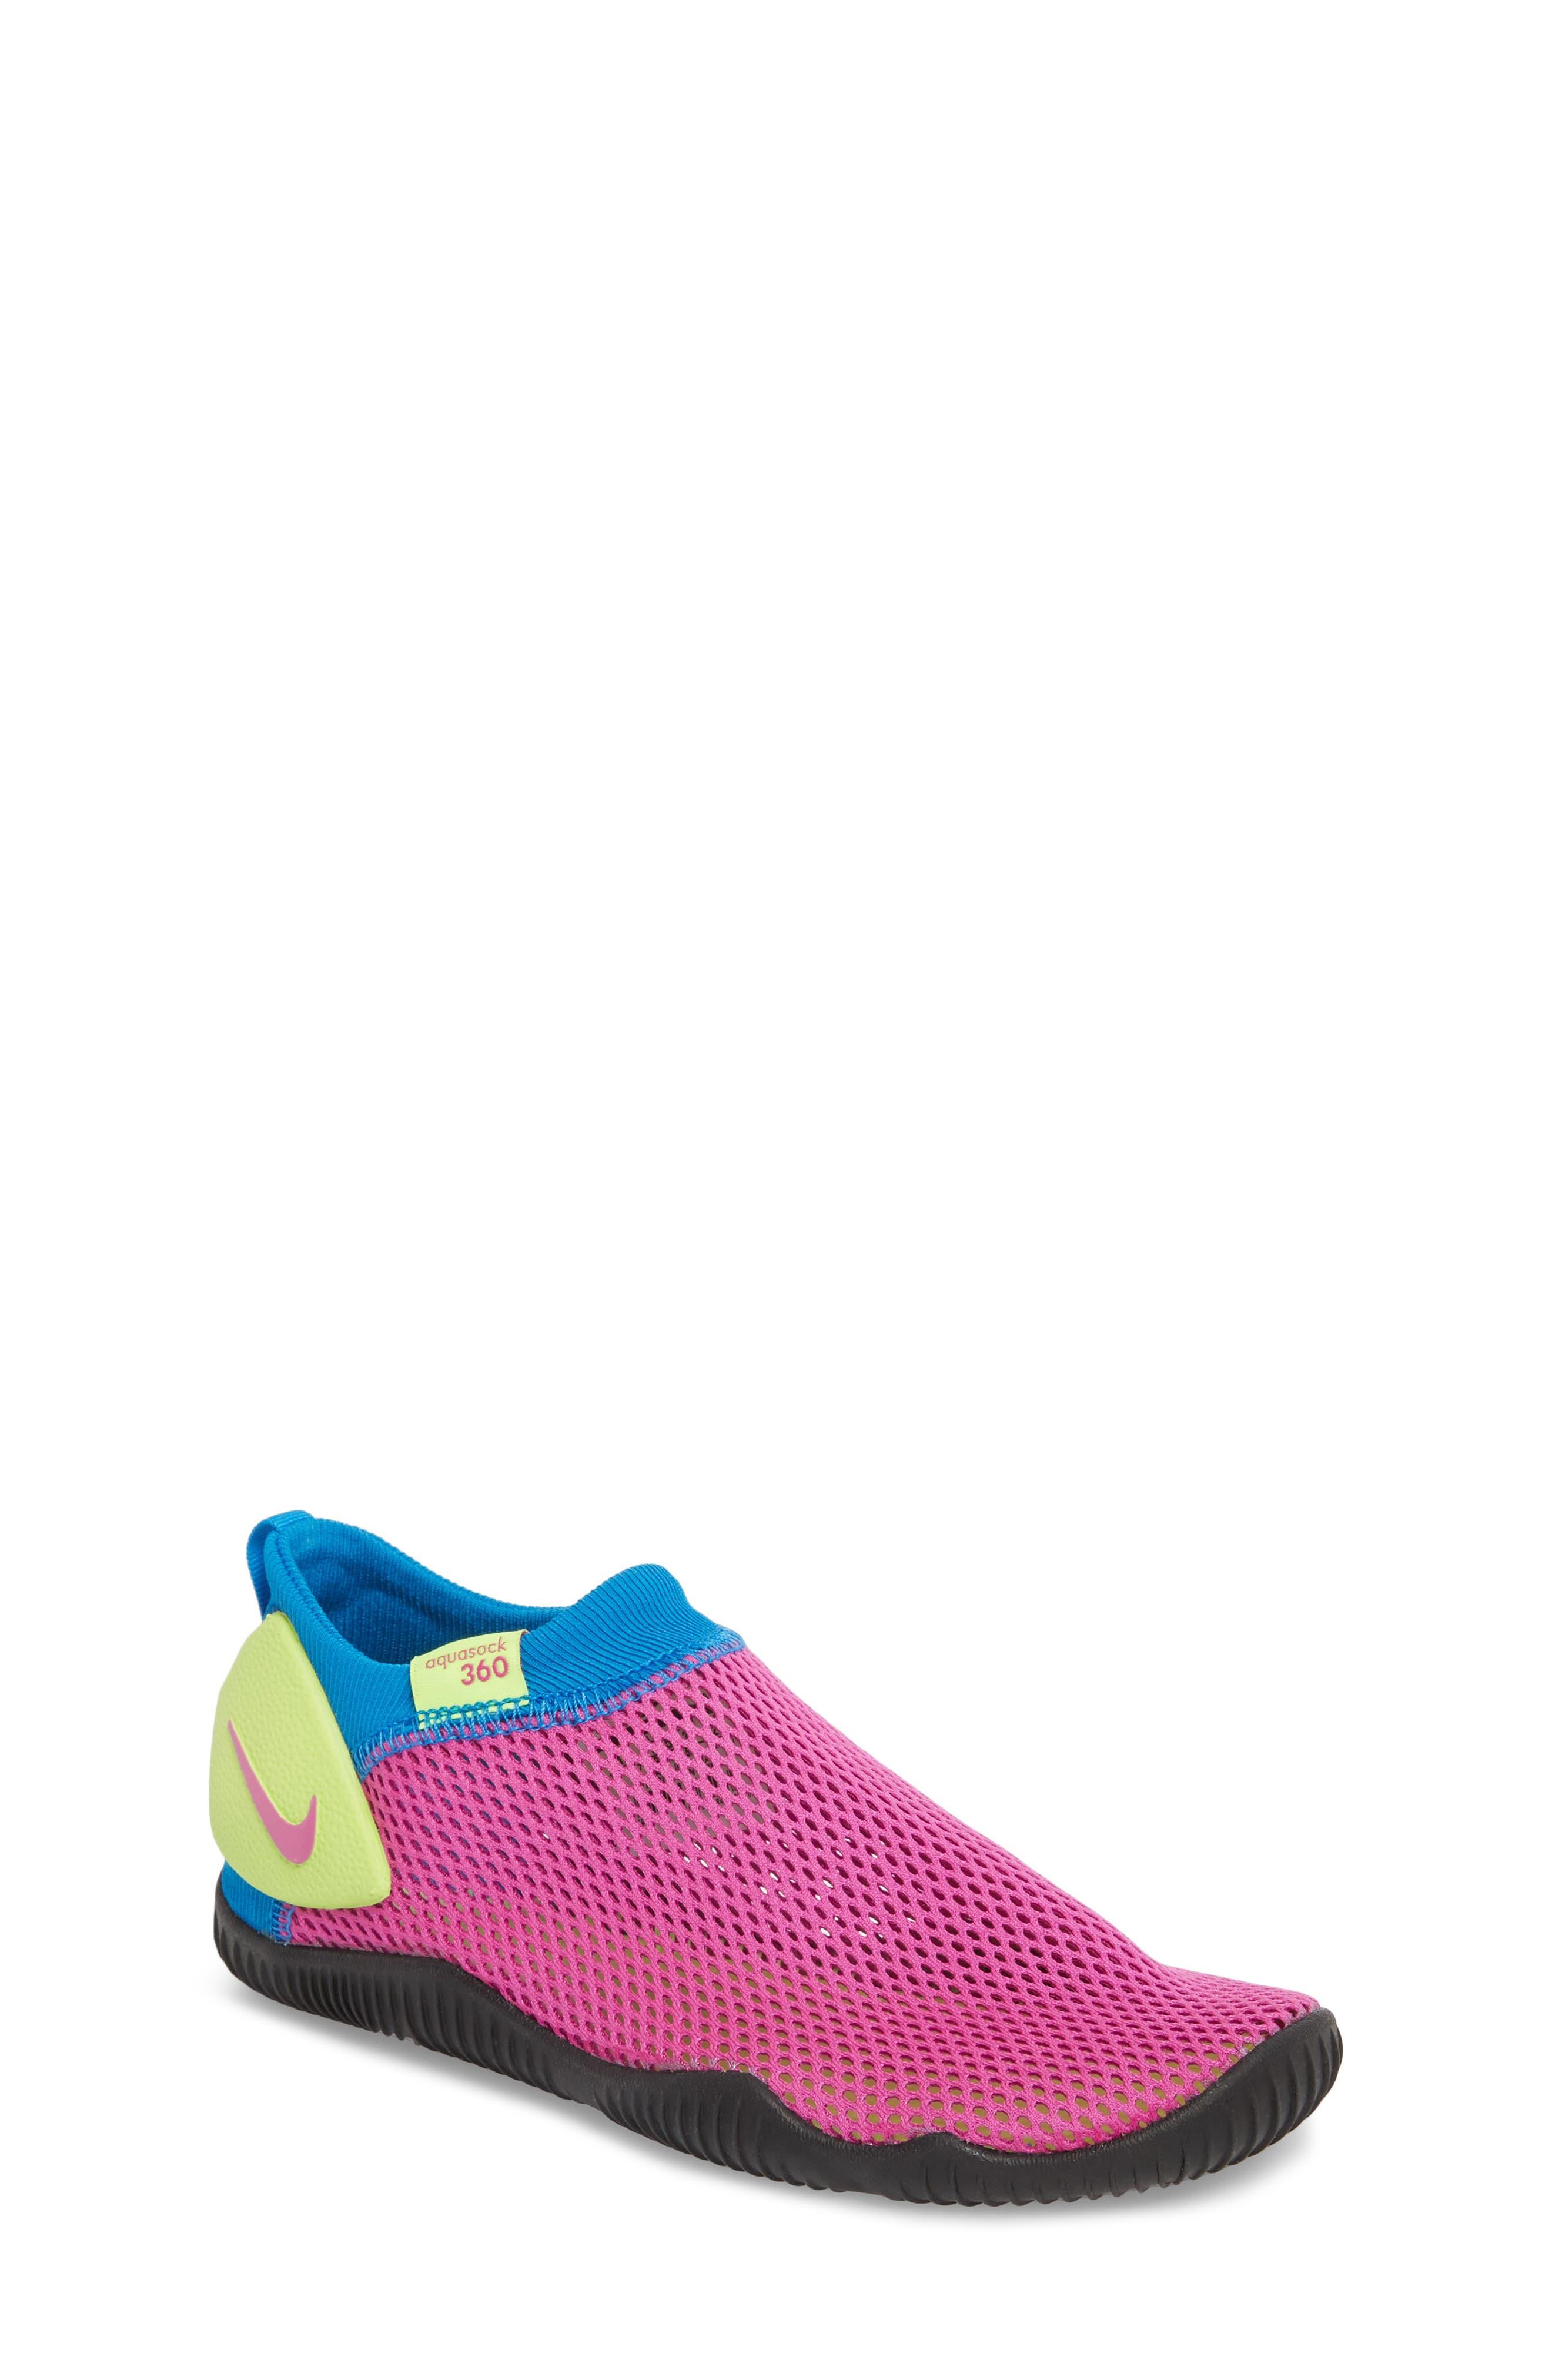 Nike Aquasock 360 Water Friendly Slip-On (Toddler, Little Kid & Big Kid)